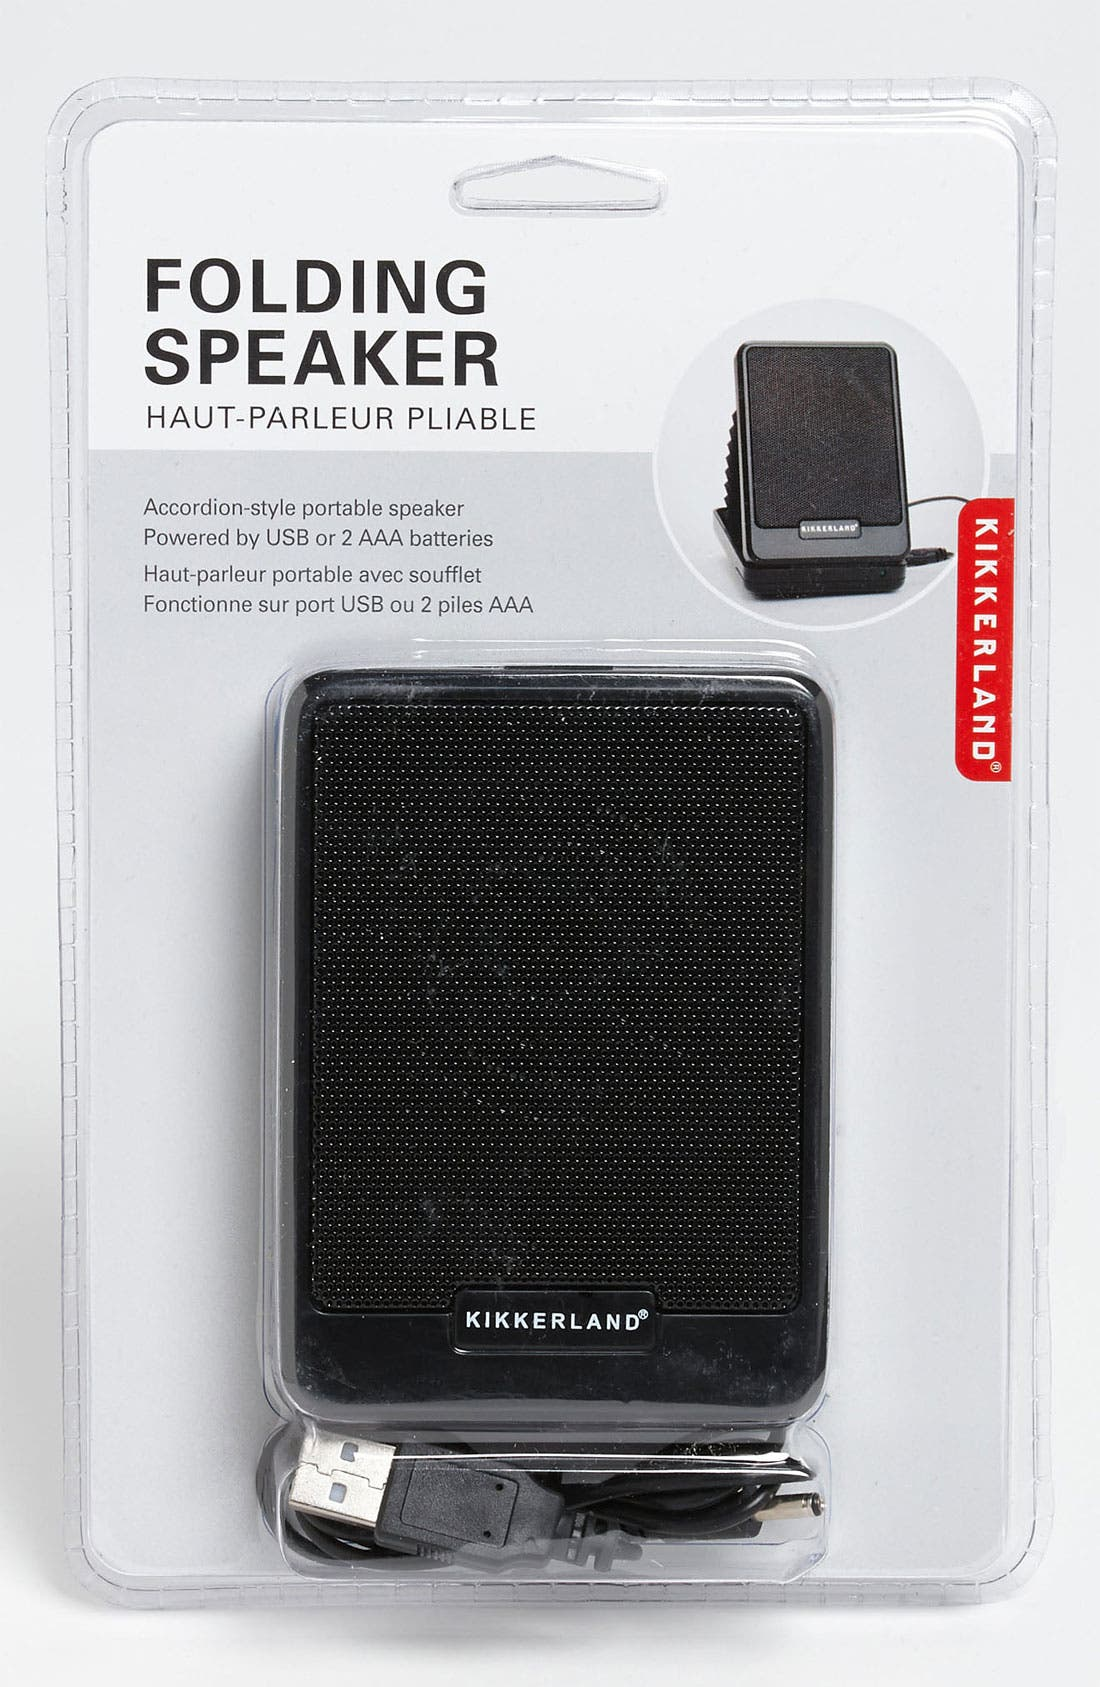 Alternate Image 1 Selected - Kikkerland Design USB Accordion Speaker